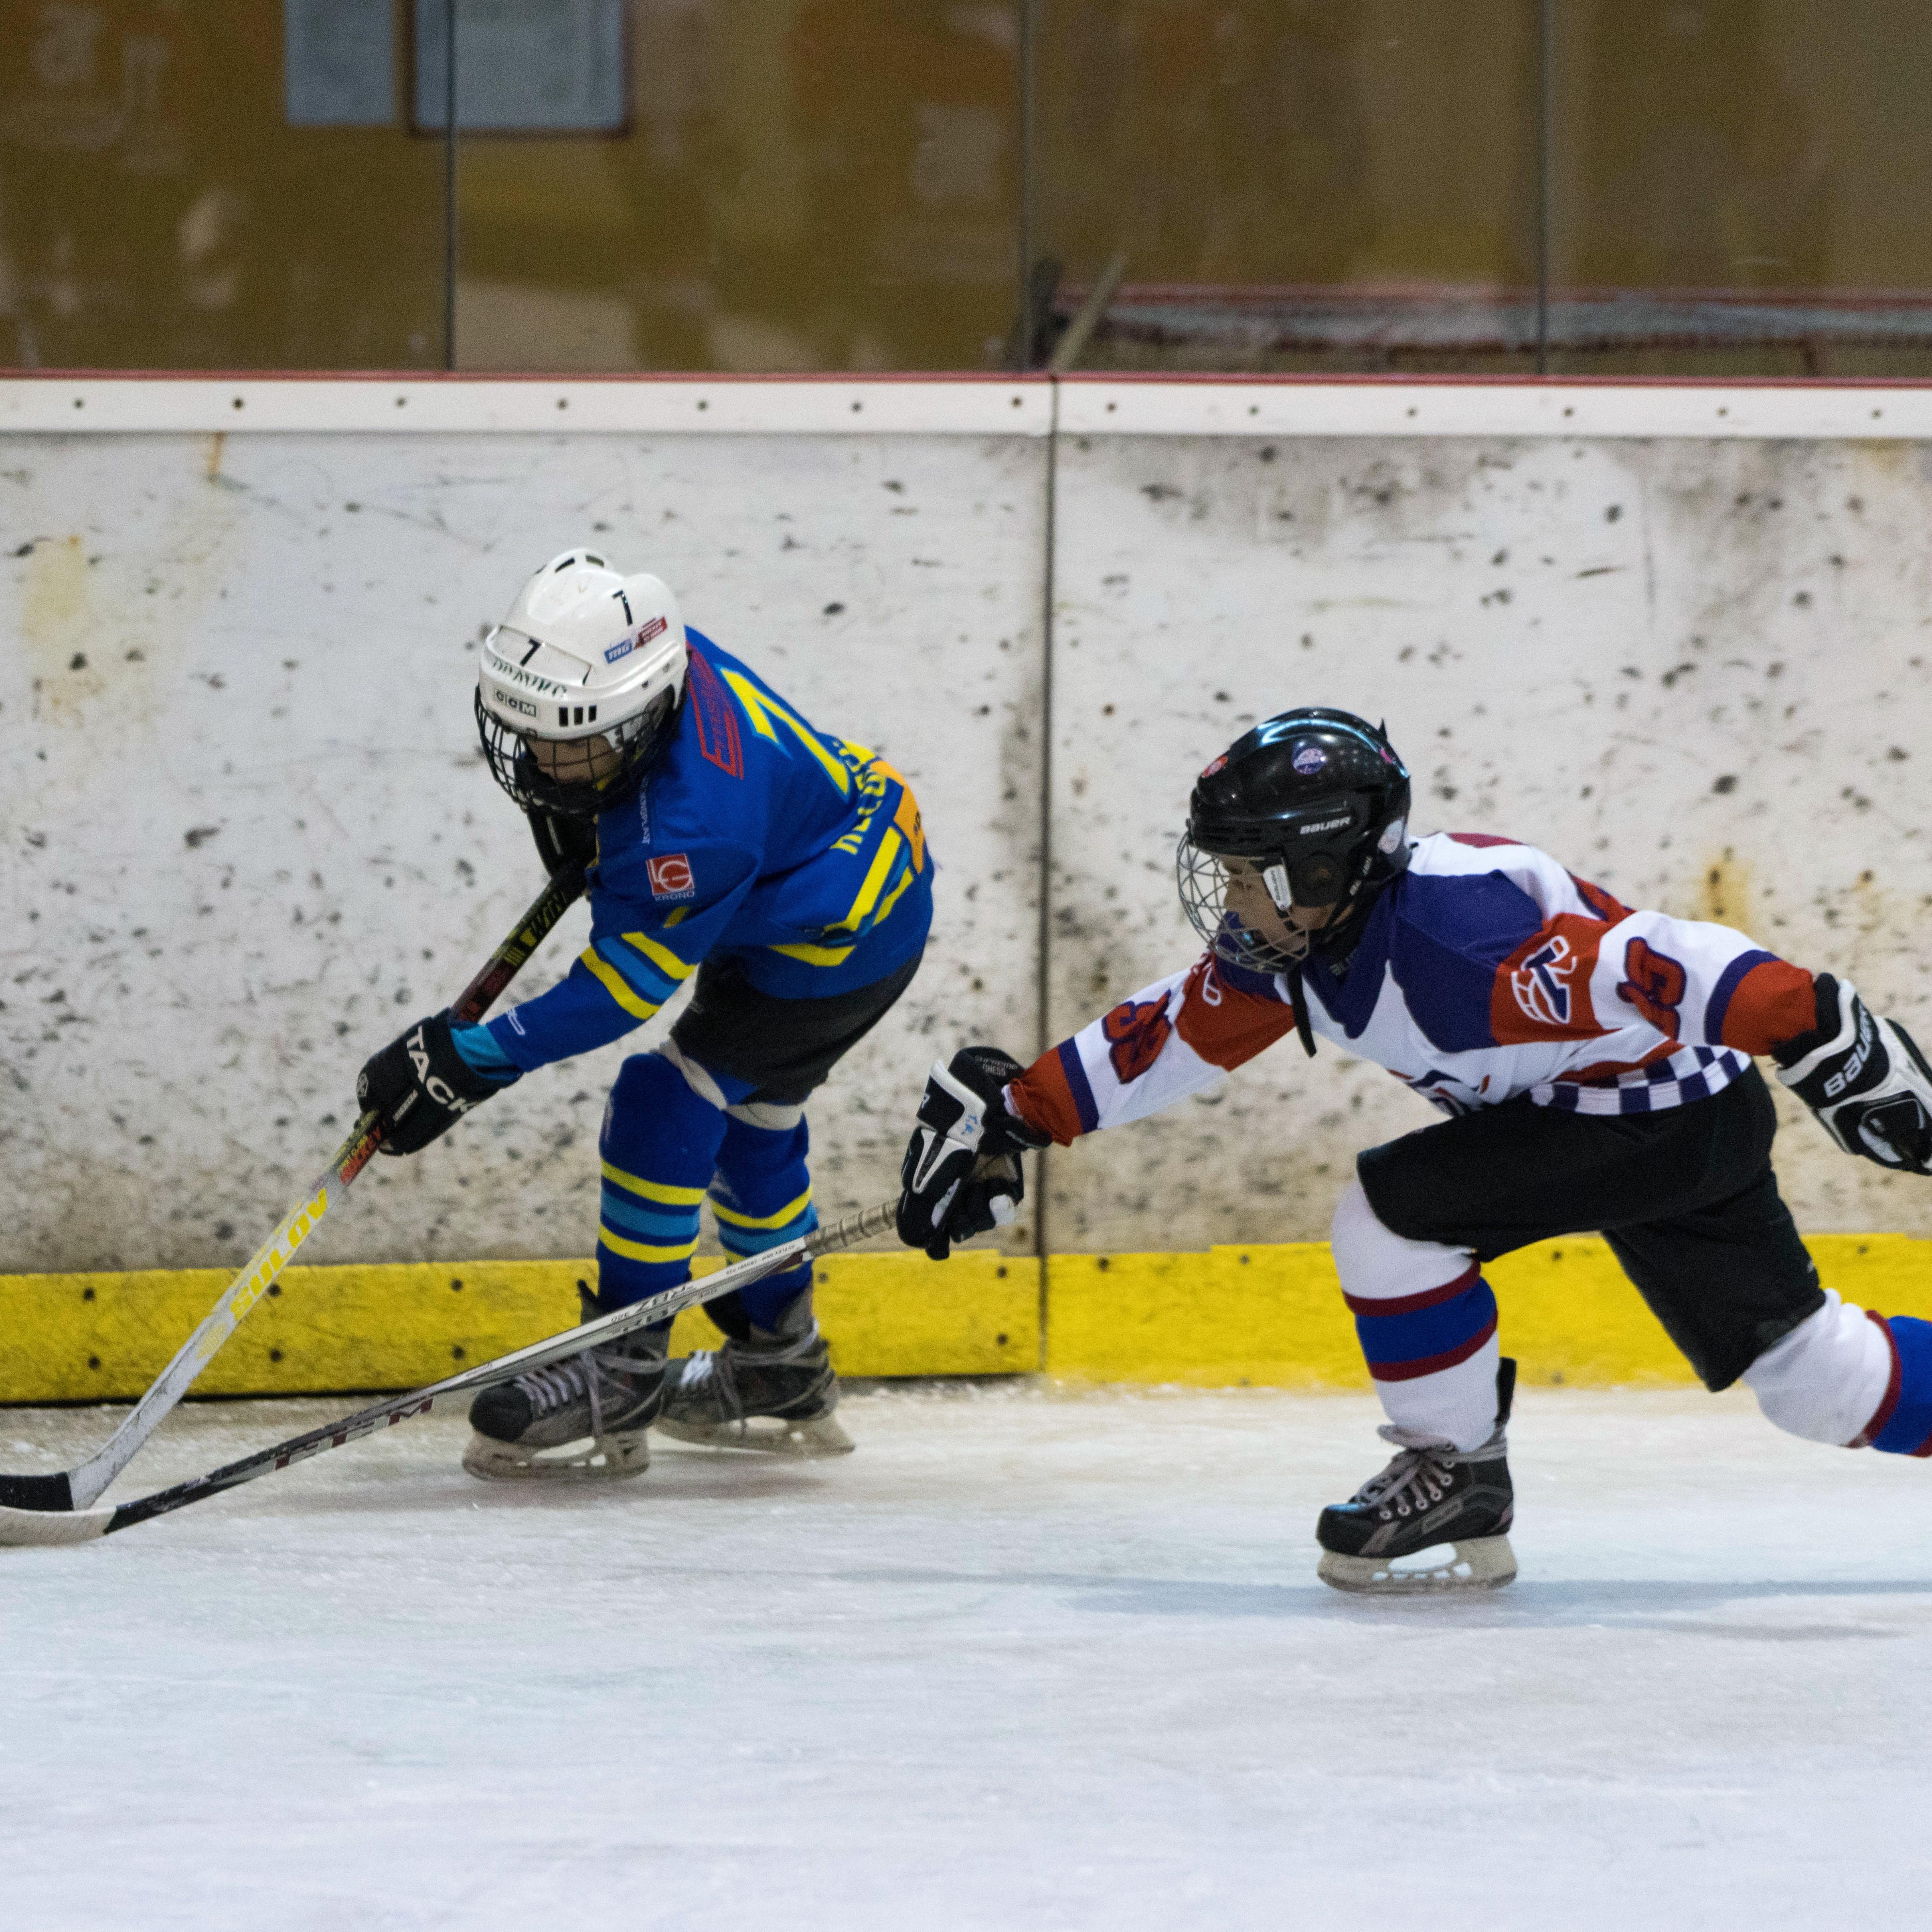 Speeders_sezona 2018_19 hokej turnaj lucenec 10